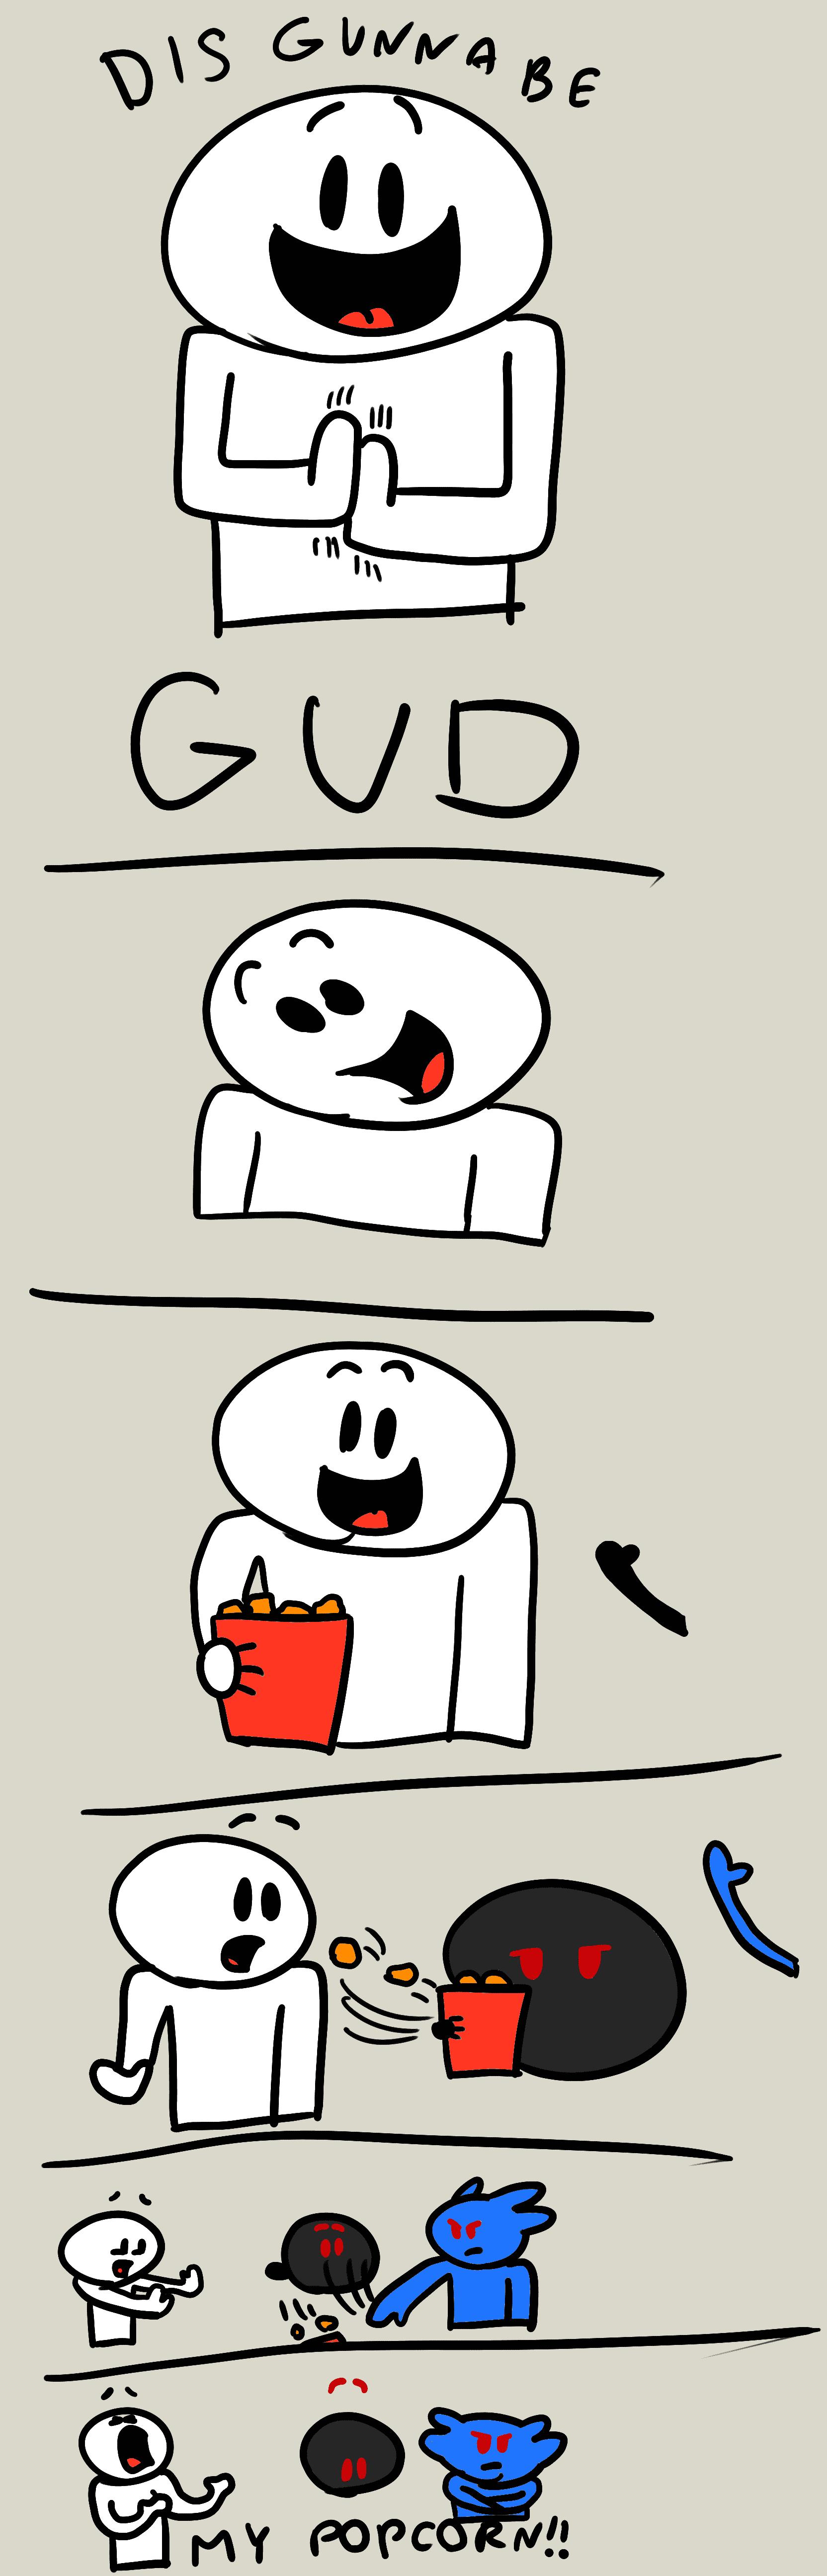 comic_popcorn.png